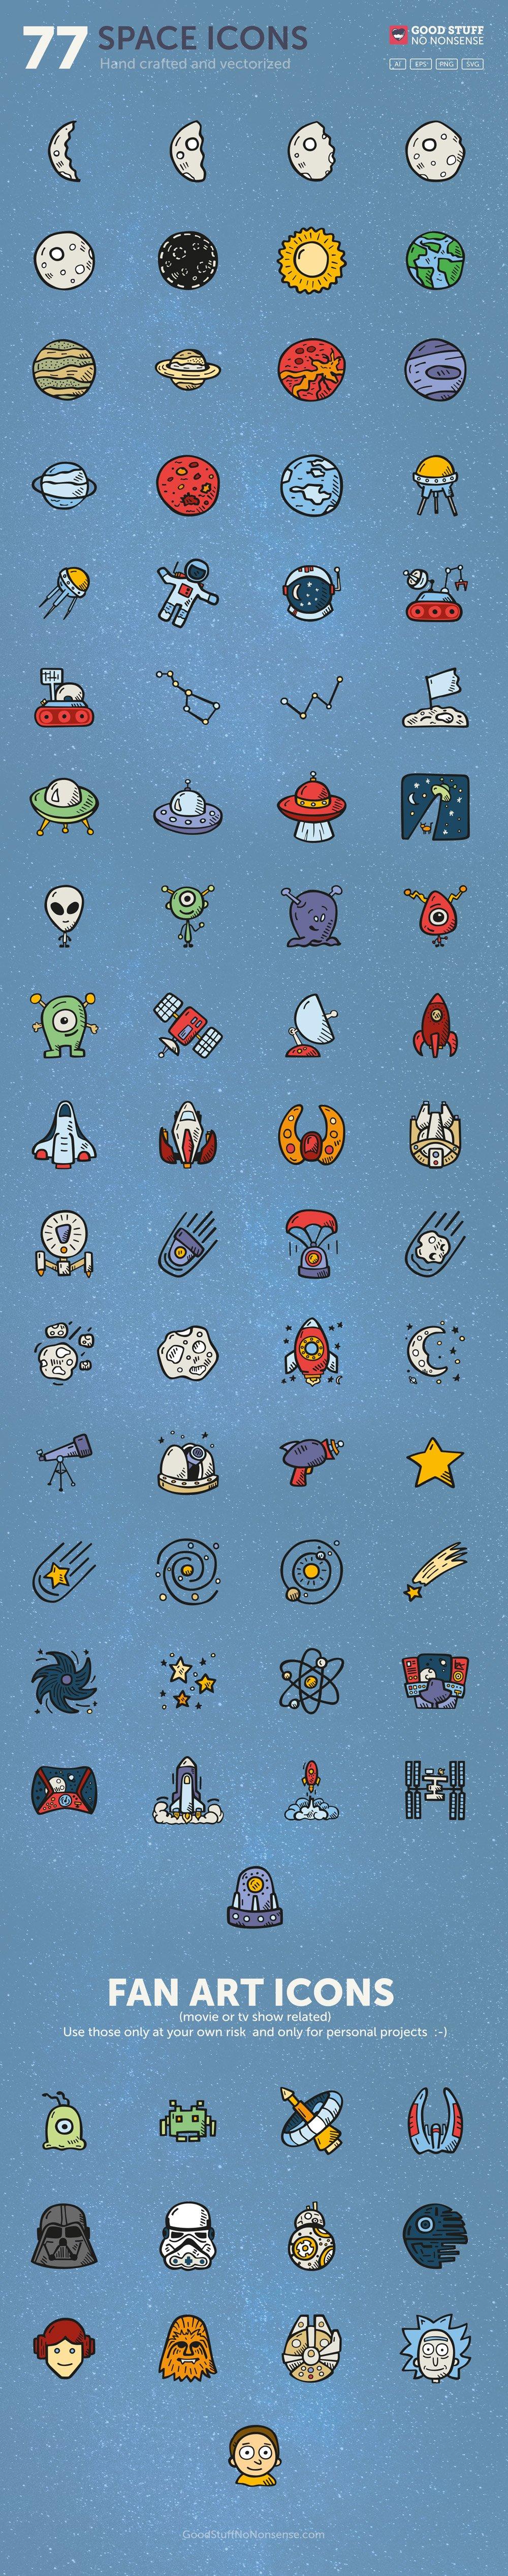 Free Space Icons - Hand Drawn Icons - Good Stuff No Nonsense